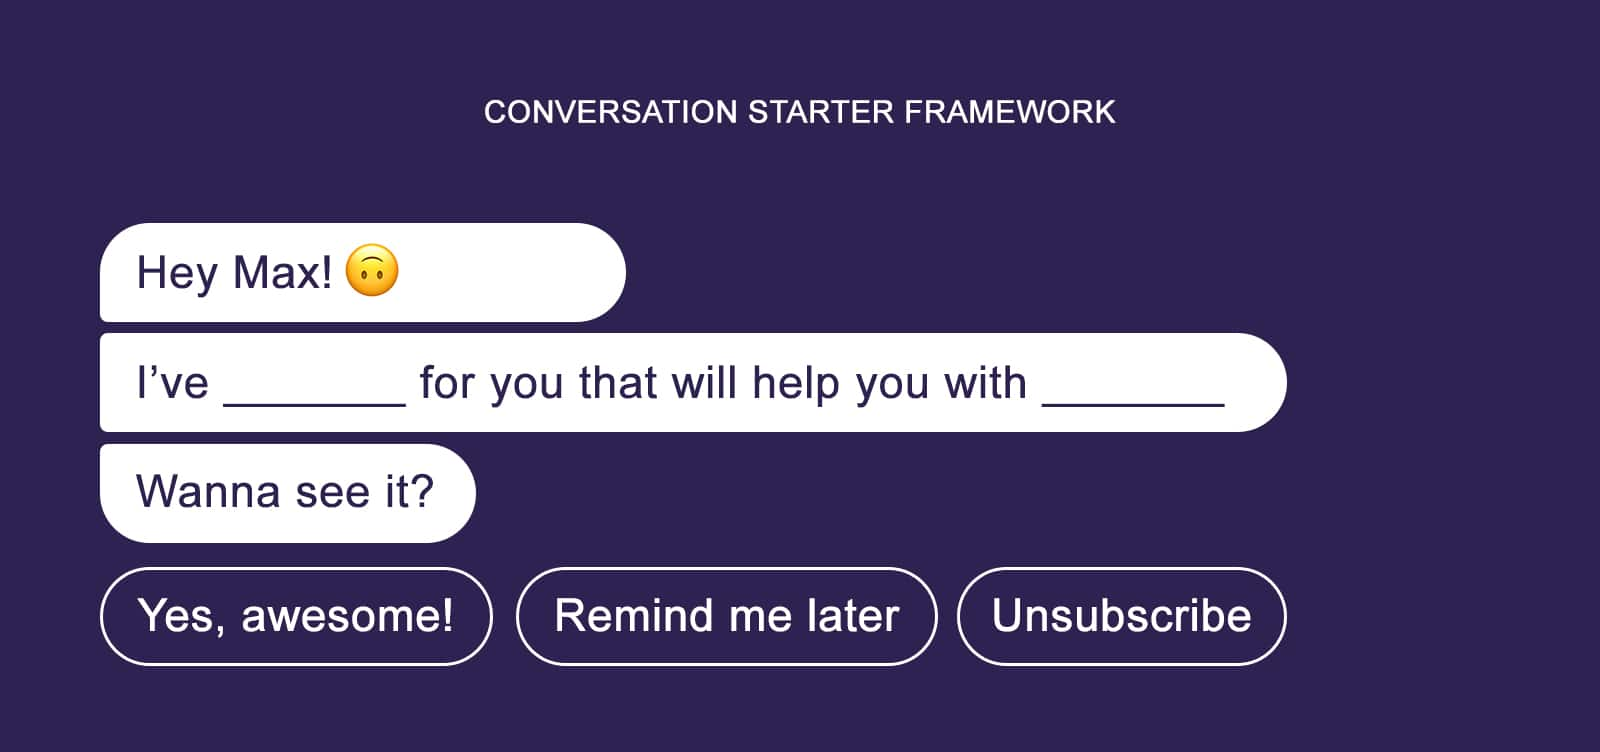 Conversation starter framework